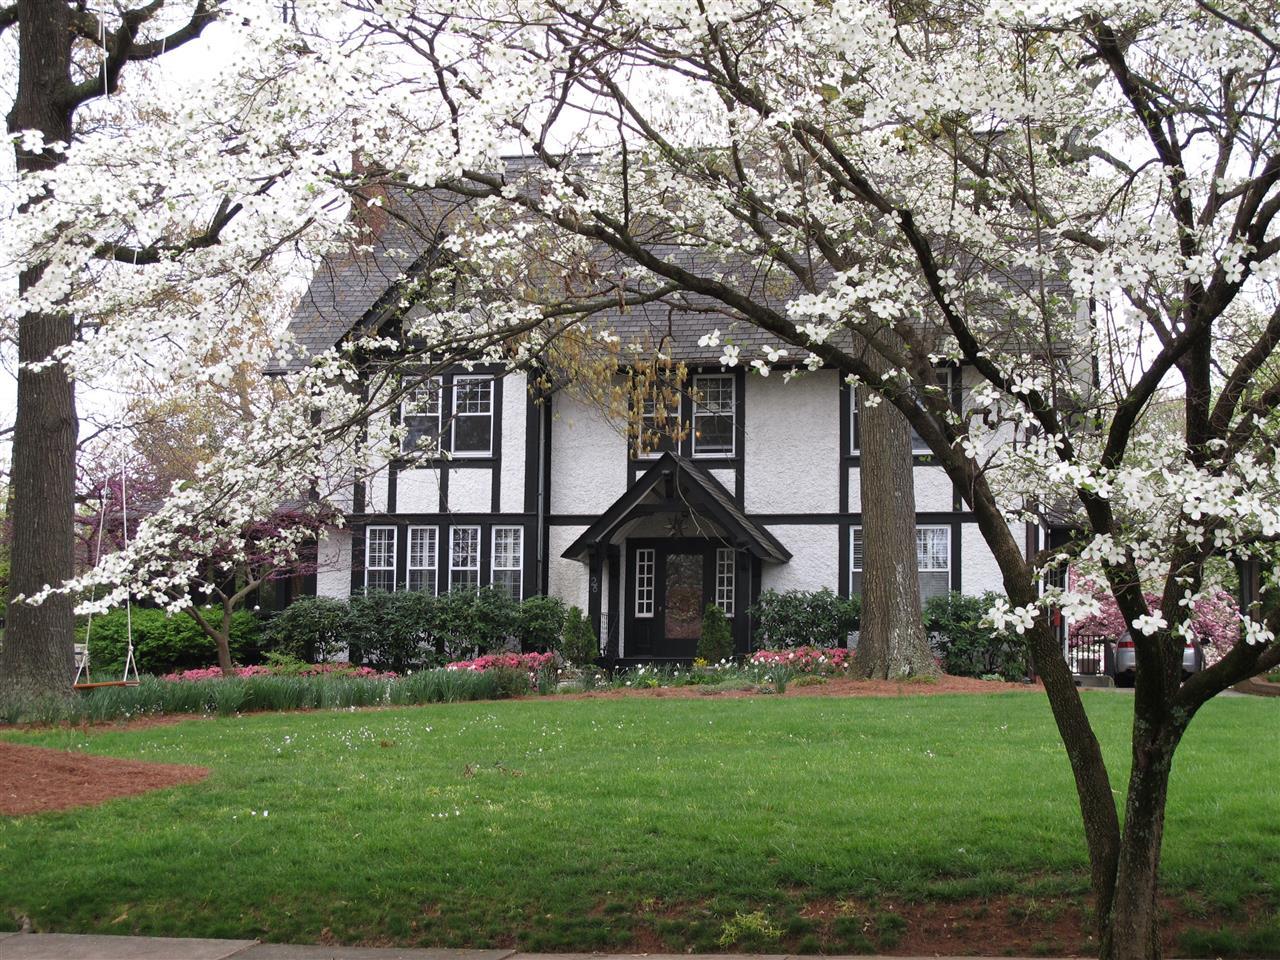 Spring in Winston-Salem, NC